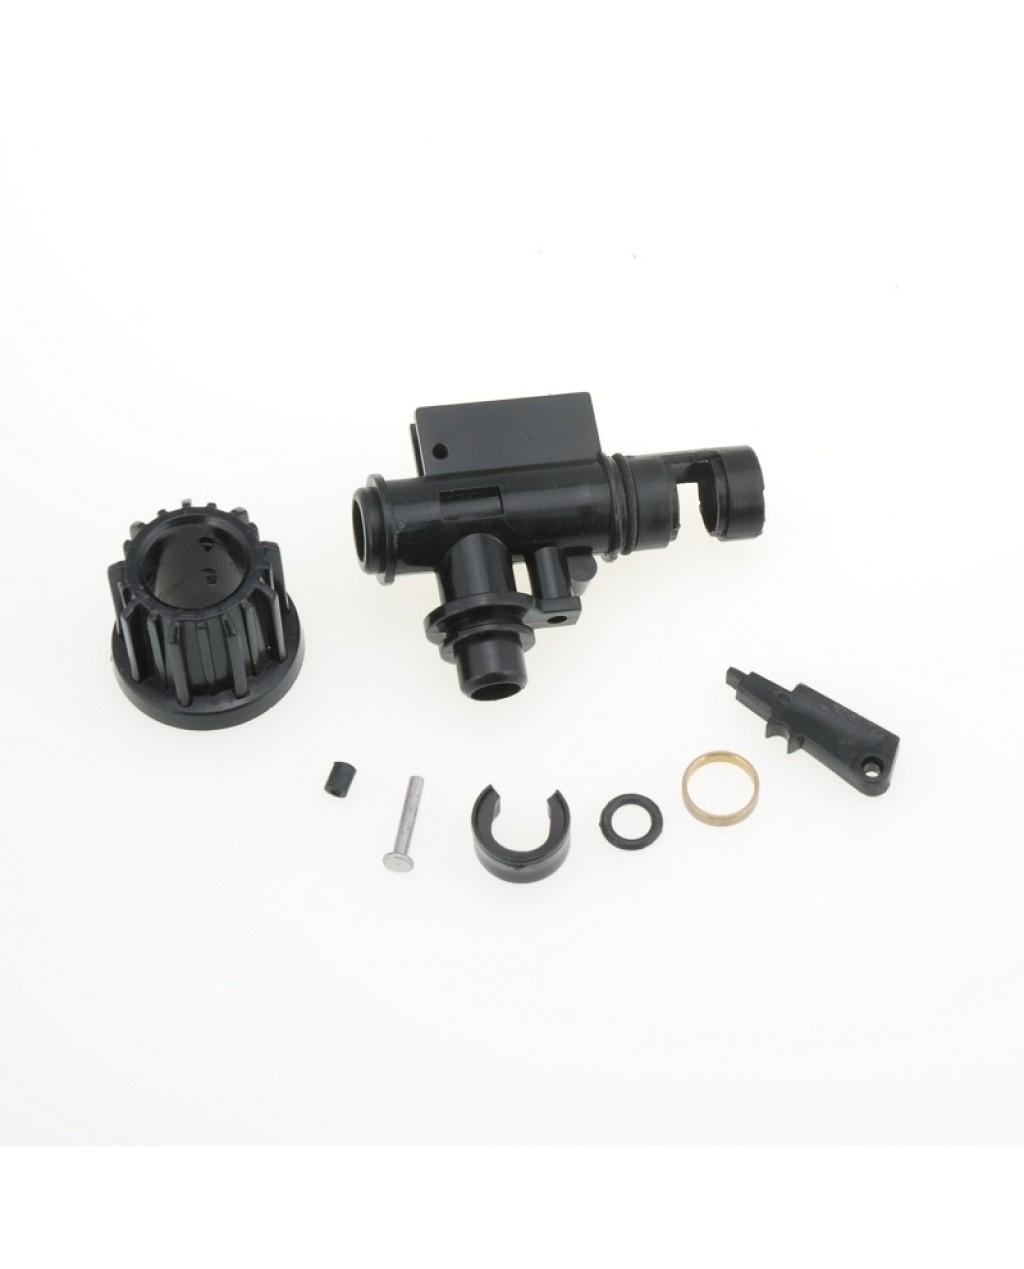 JG Reinforced Hop-up Unit for G3 / T3 /SIG Series Replicas